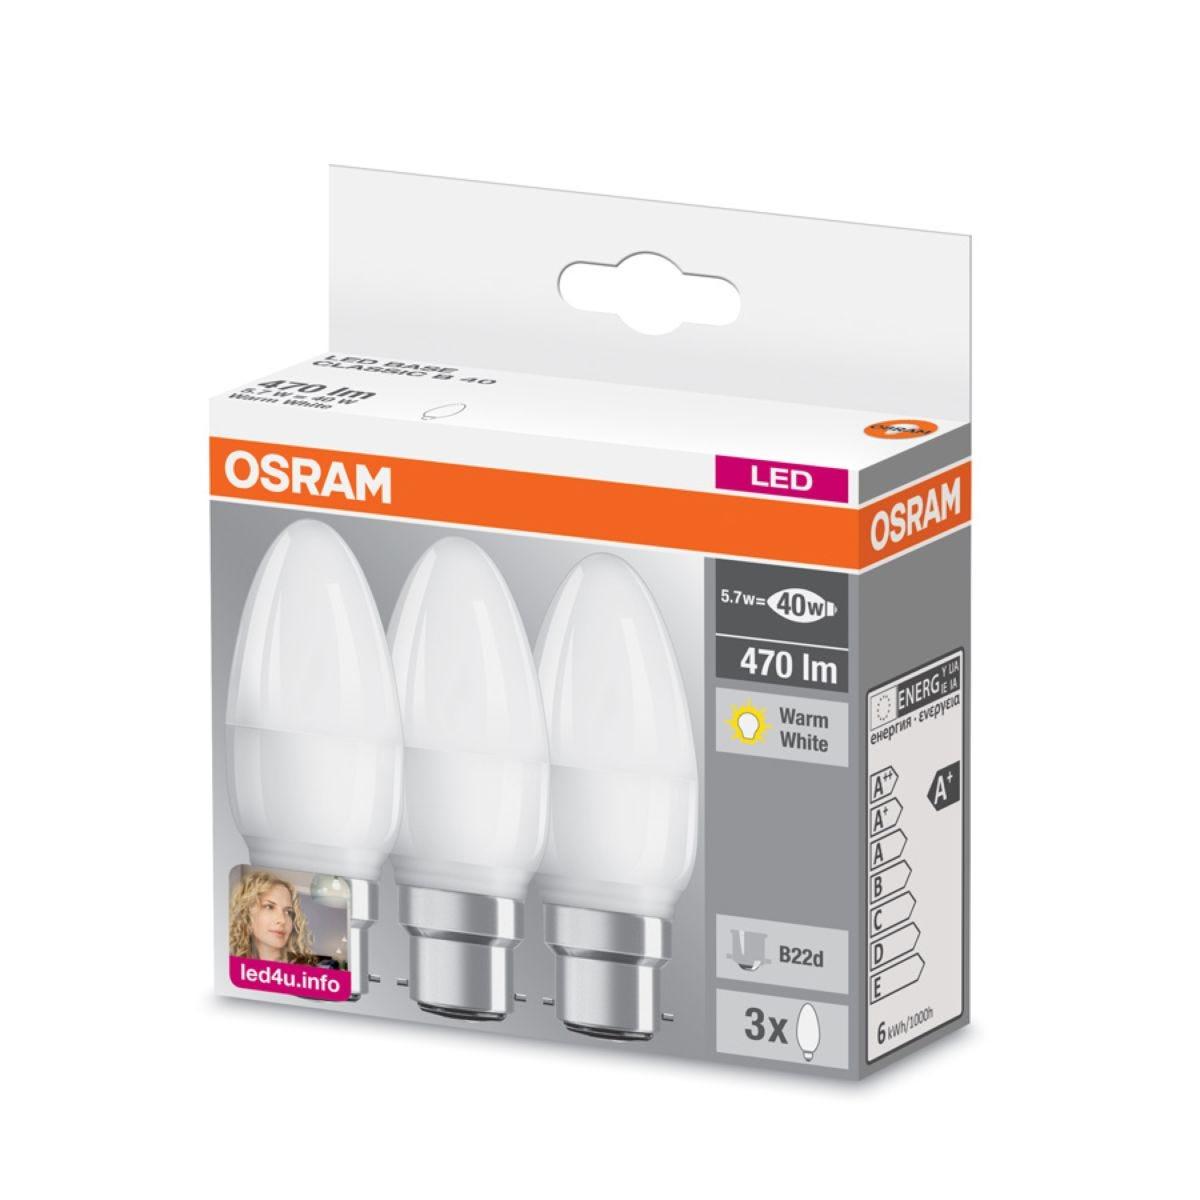 Osram LED Candle 40W BC Light Bulbs